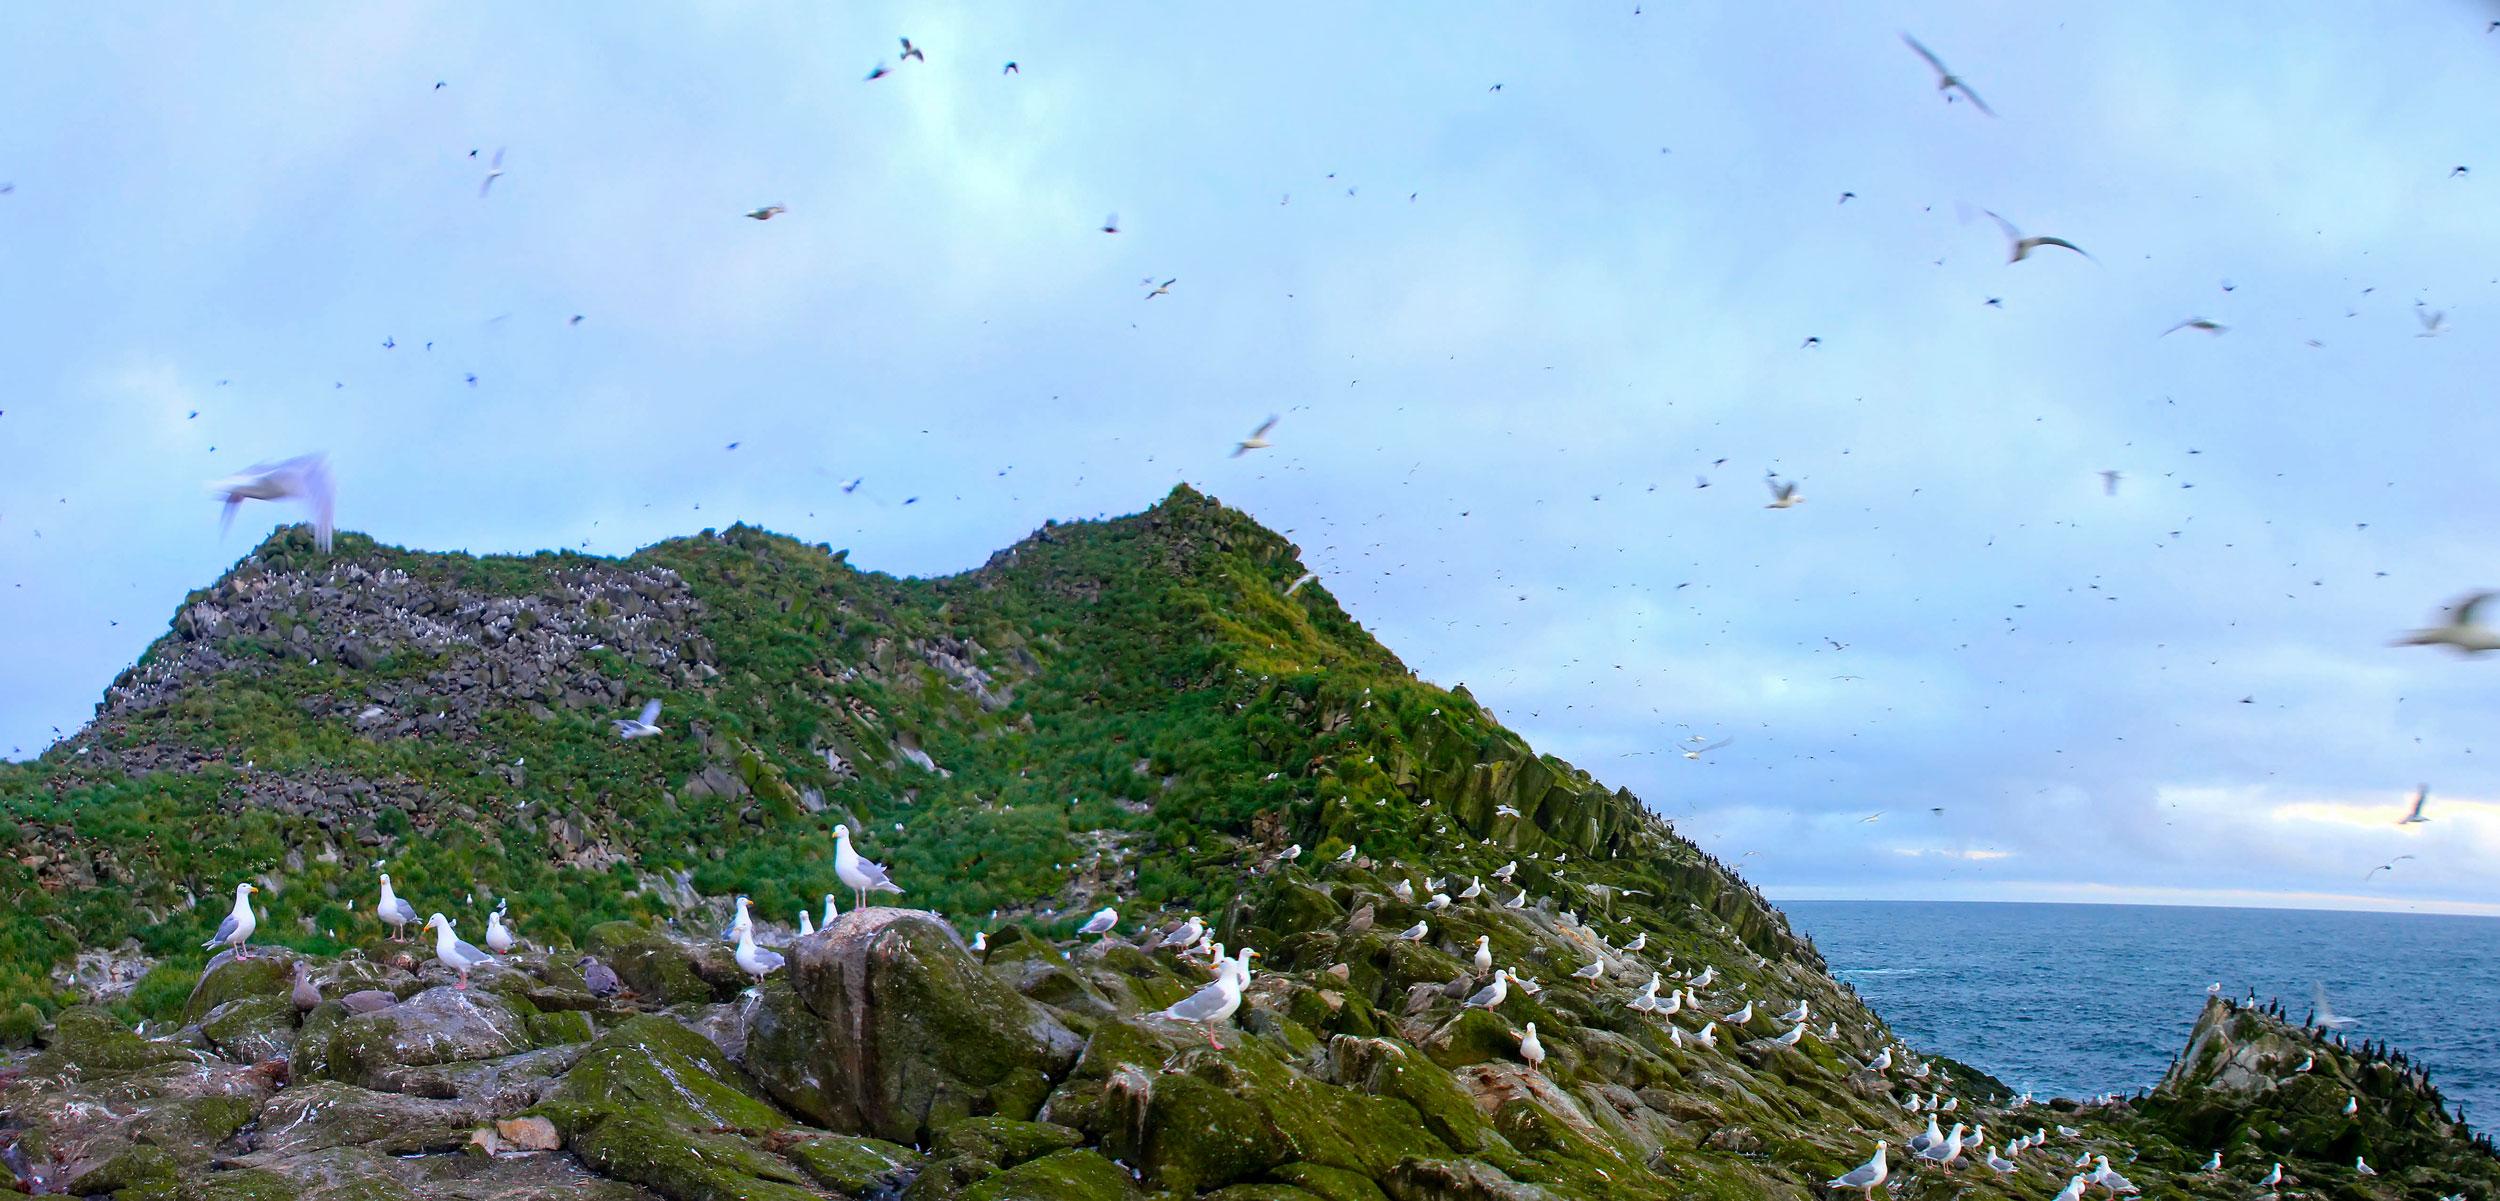 birds flocking in the Aleutian Islands